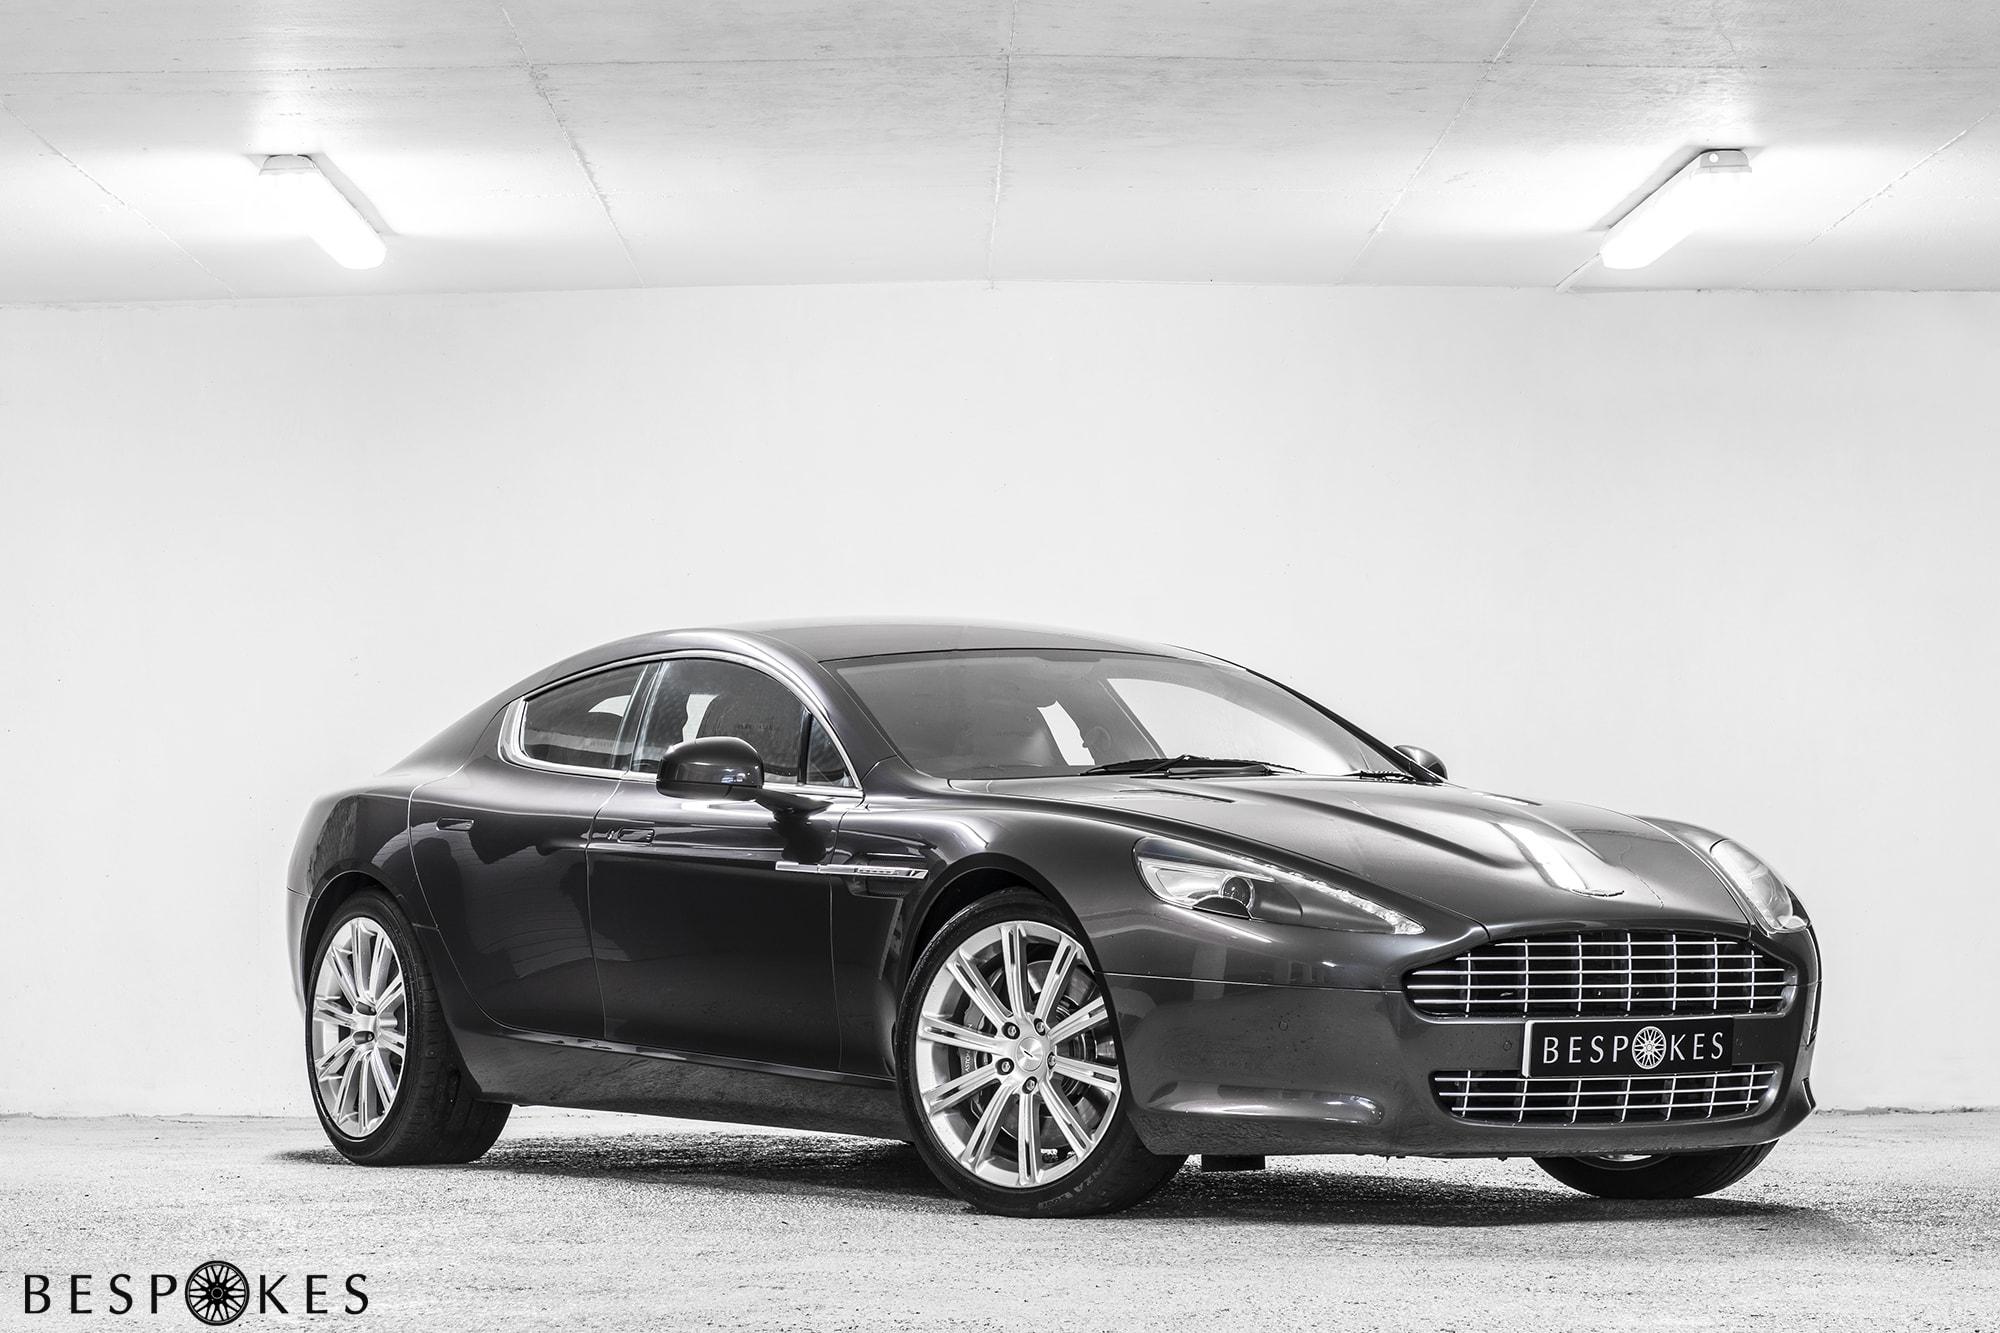 Aston Martin Rapide Bespokes